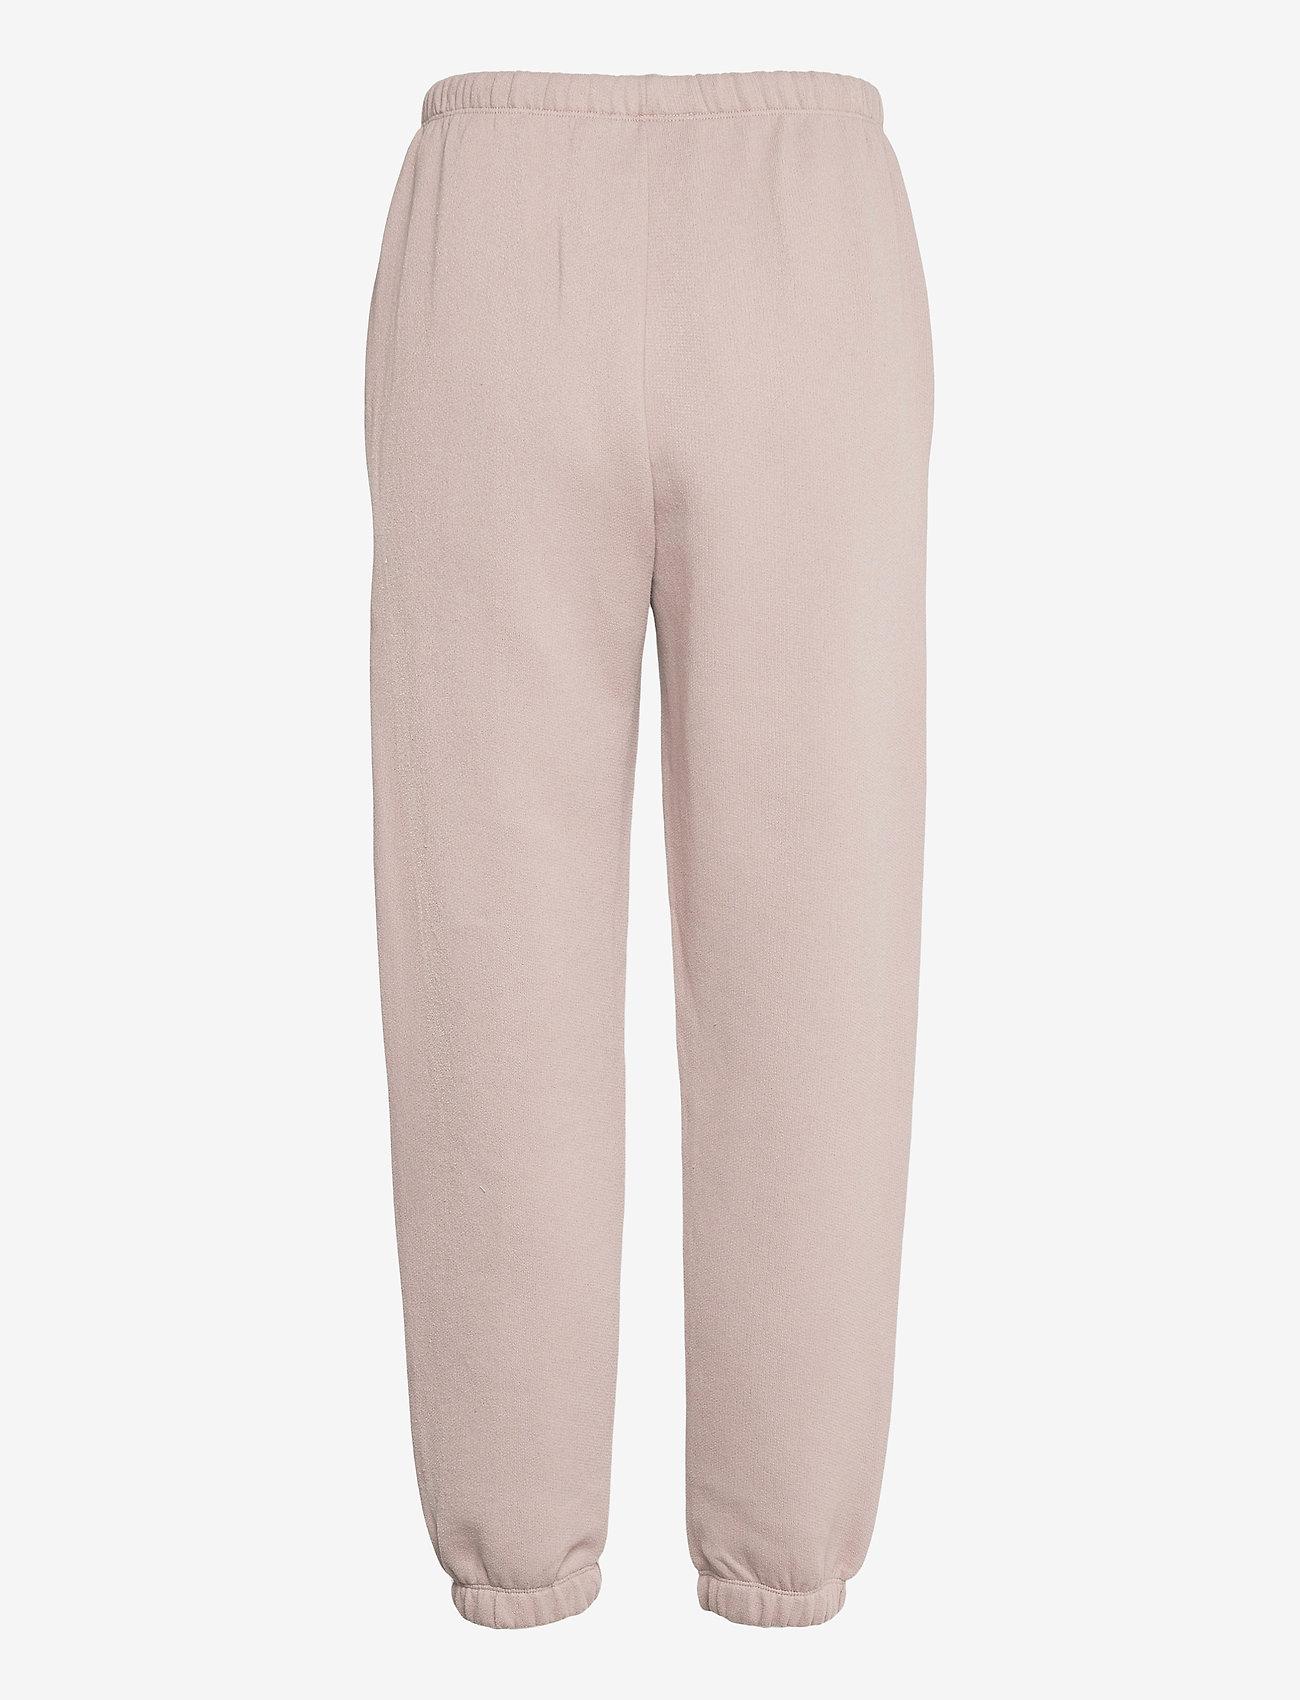 American Vintage - IKATOWN - sweatpants - taupe - 1